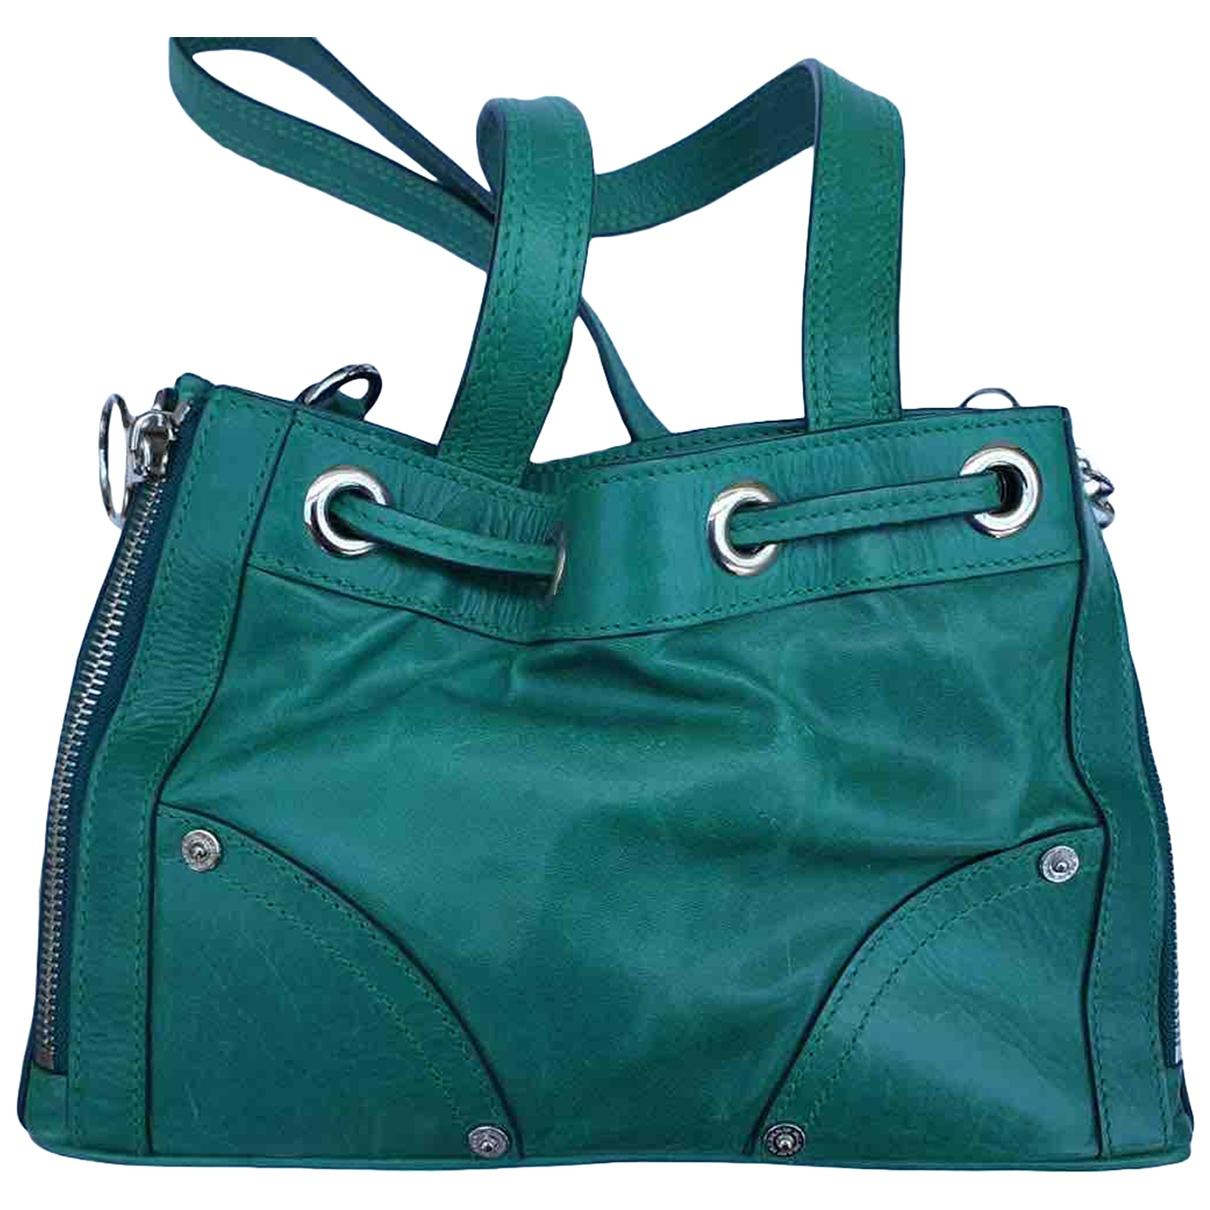 Mulberry \N Green Leather handbag for Women \N